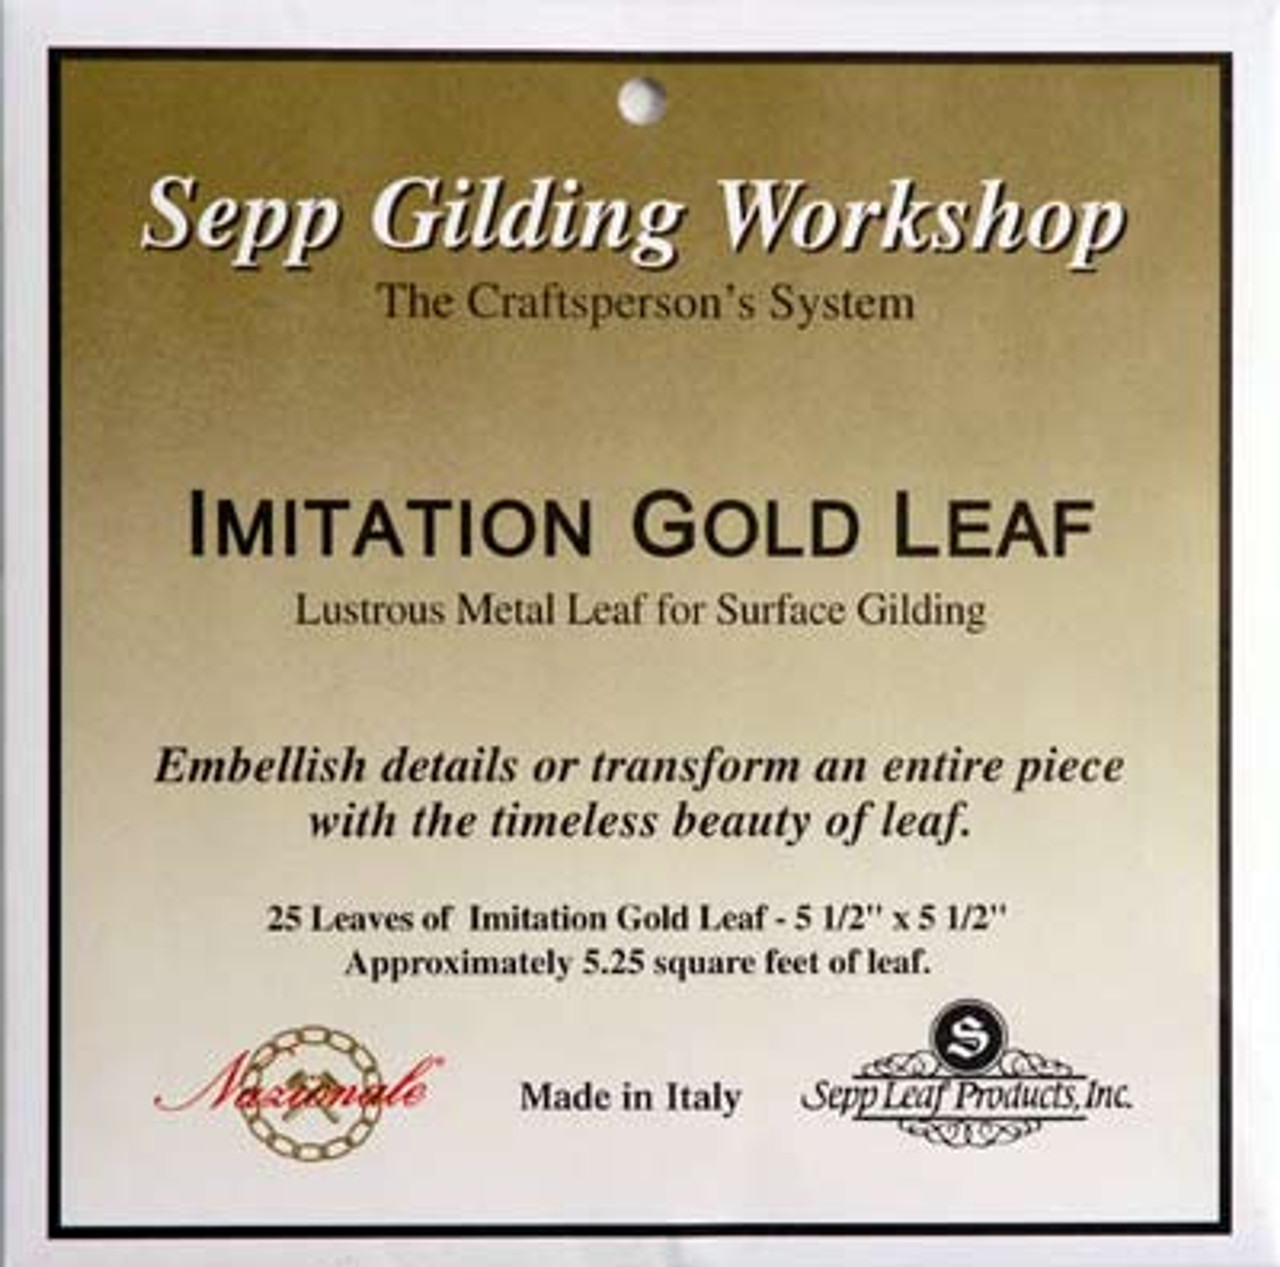 Individual books of Nazionale Composition Gold Leaf,  packed under Sepp Gilding Workshop label